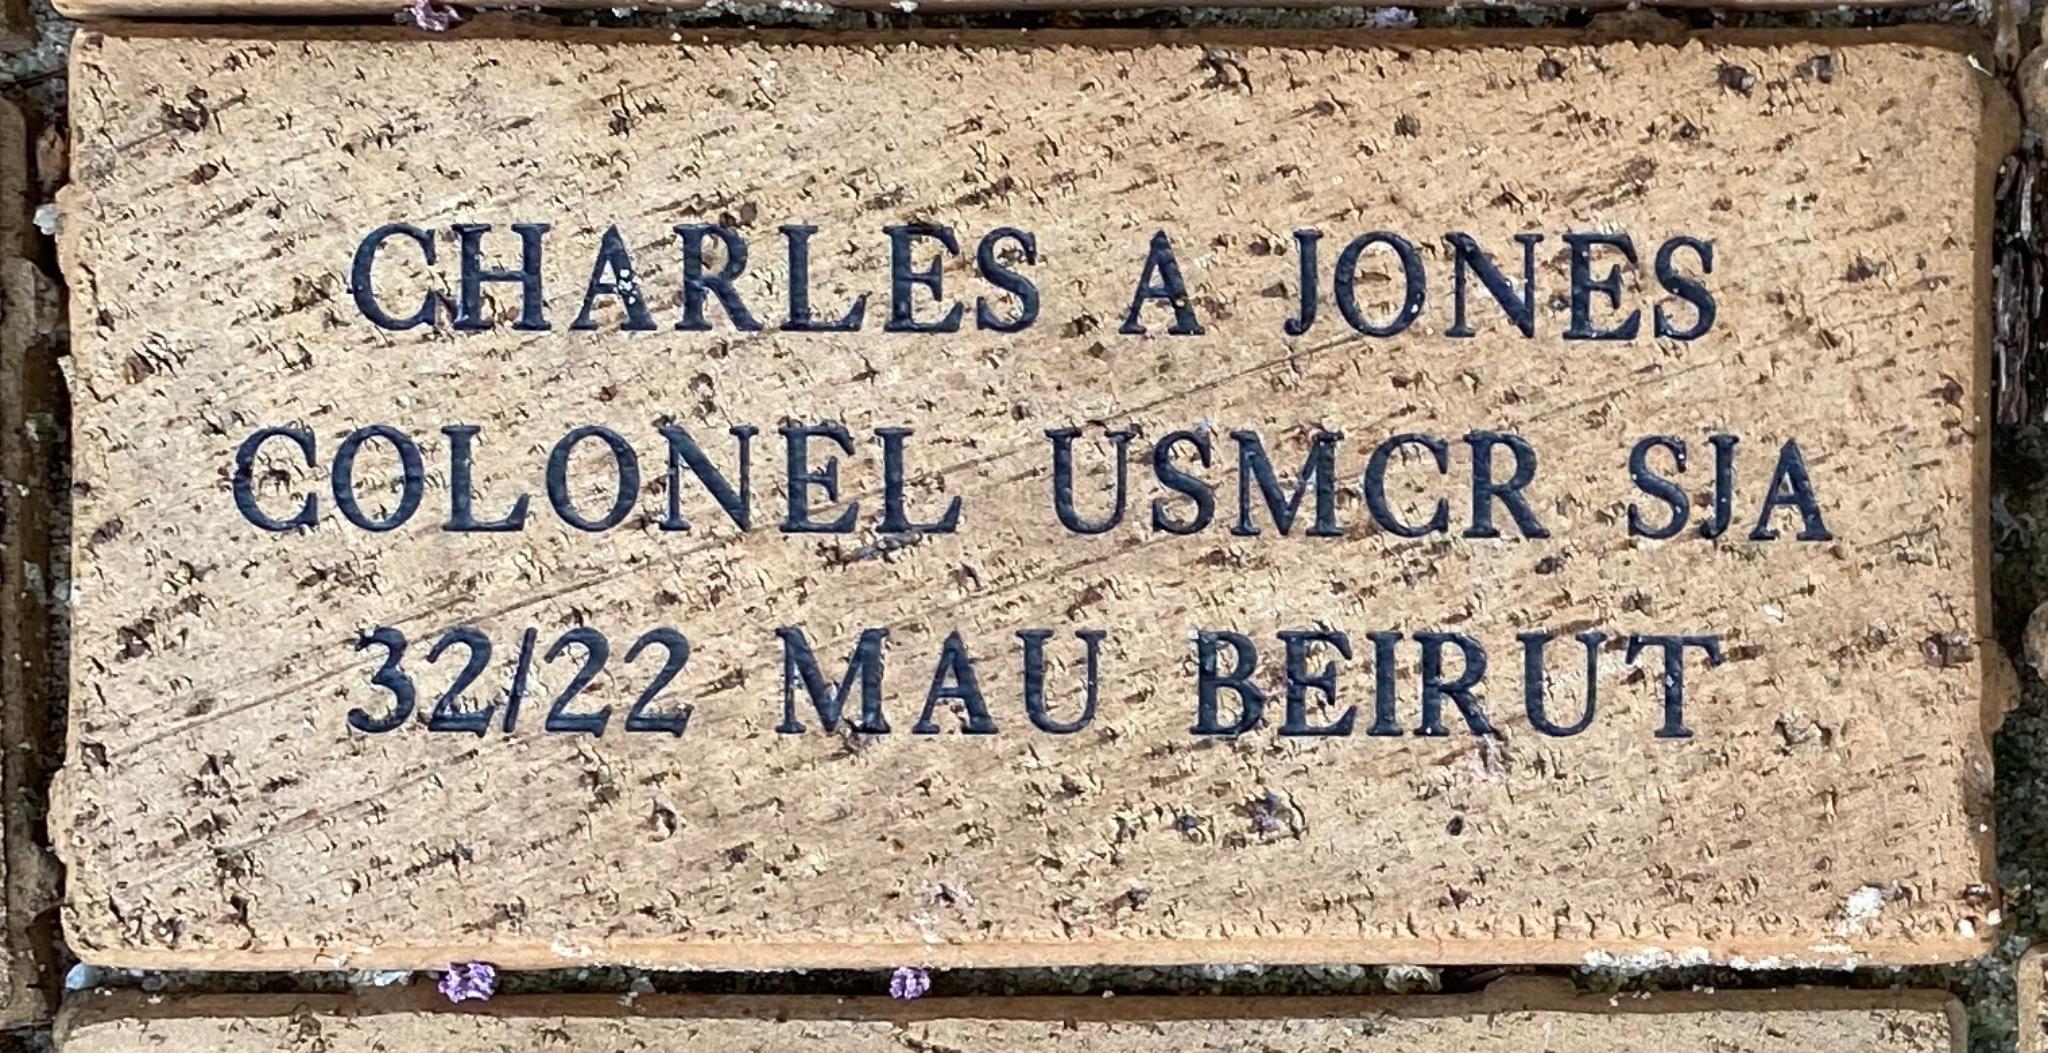 CHARLES A JONES COLONEL USMCR SJA 32/22 MAU BEIRUT